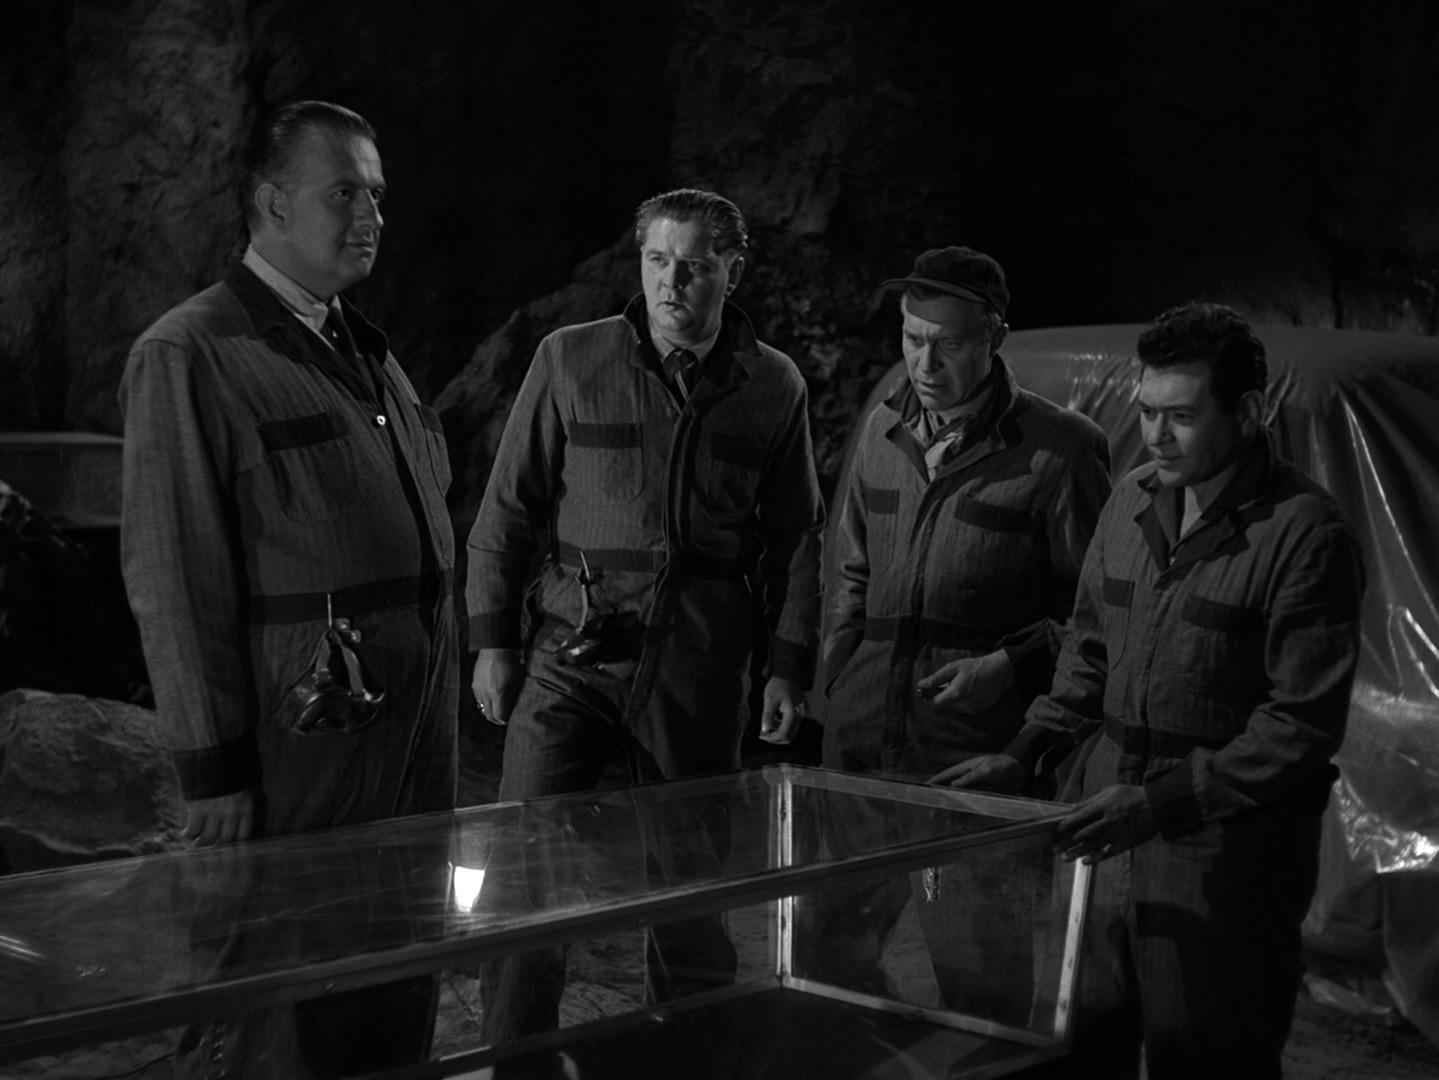 The Twilight Zone Companion Summary & Study Guide